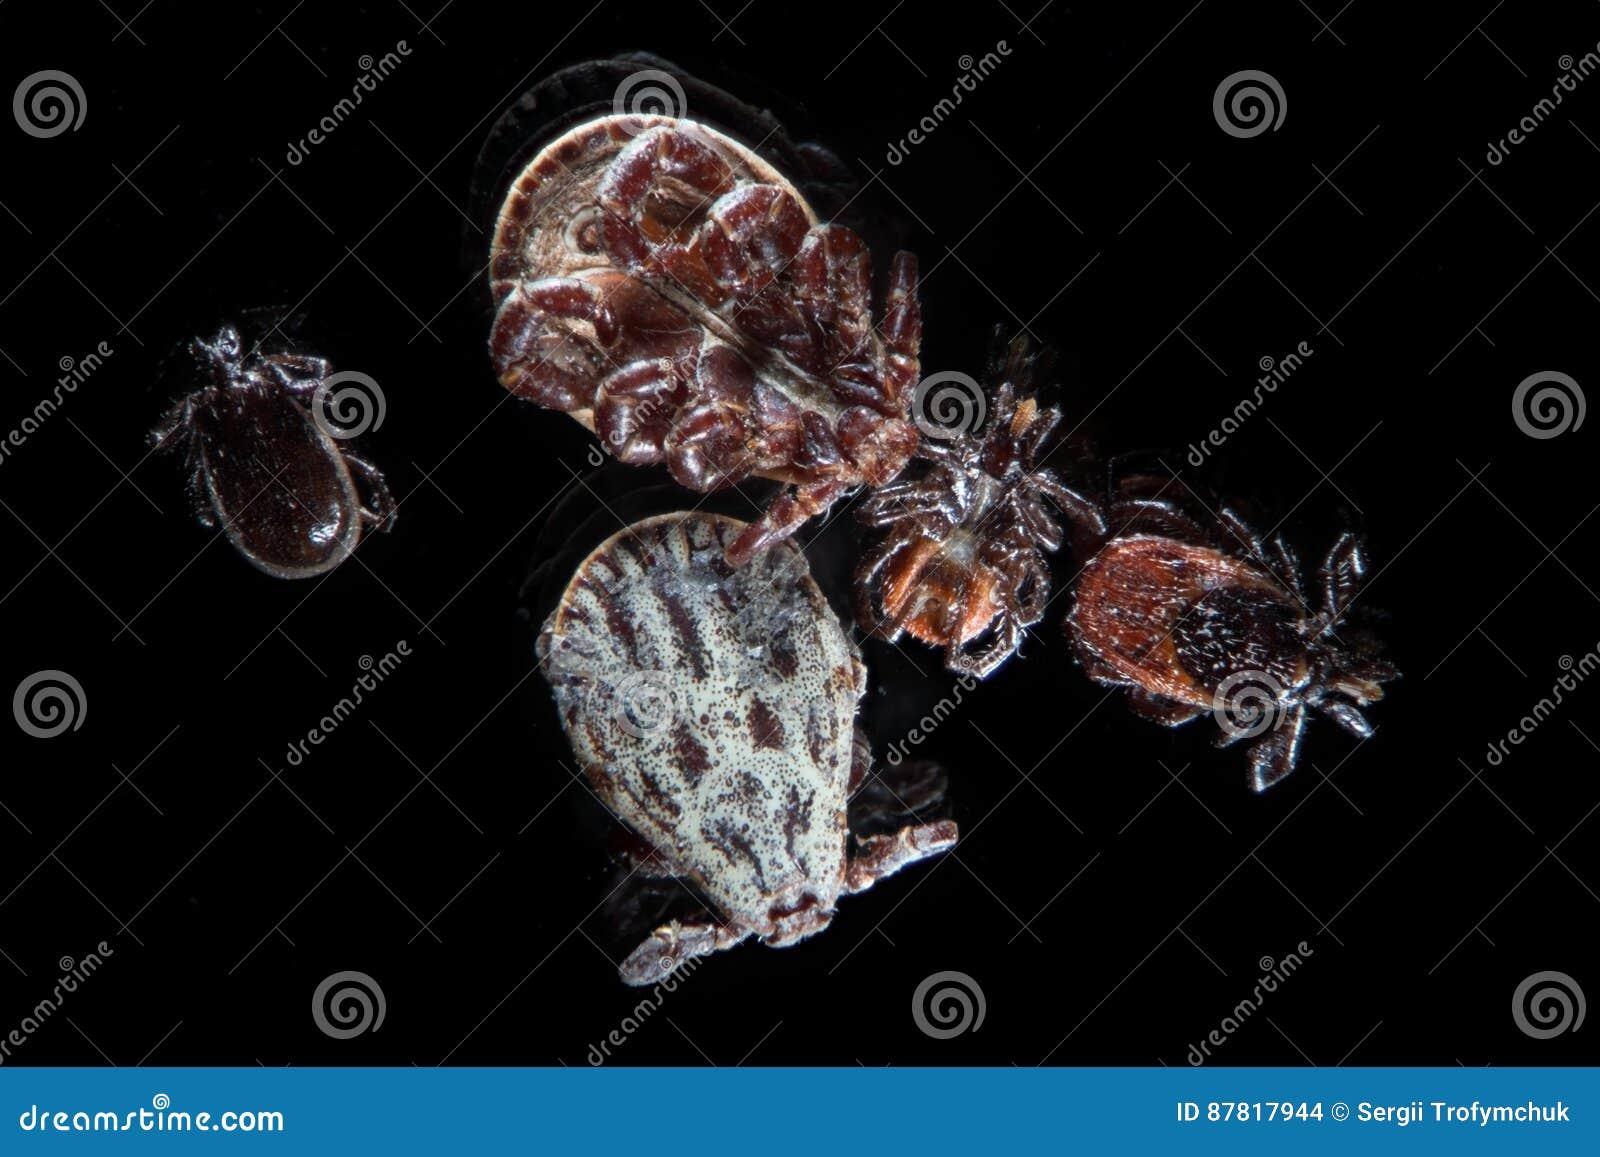 Microscopic parasites ticks, mites, Ixodes scapularis or deer tick or blacklegged tick, Dermacentor reticulatus or Ornate Cow Tick